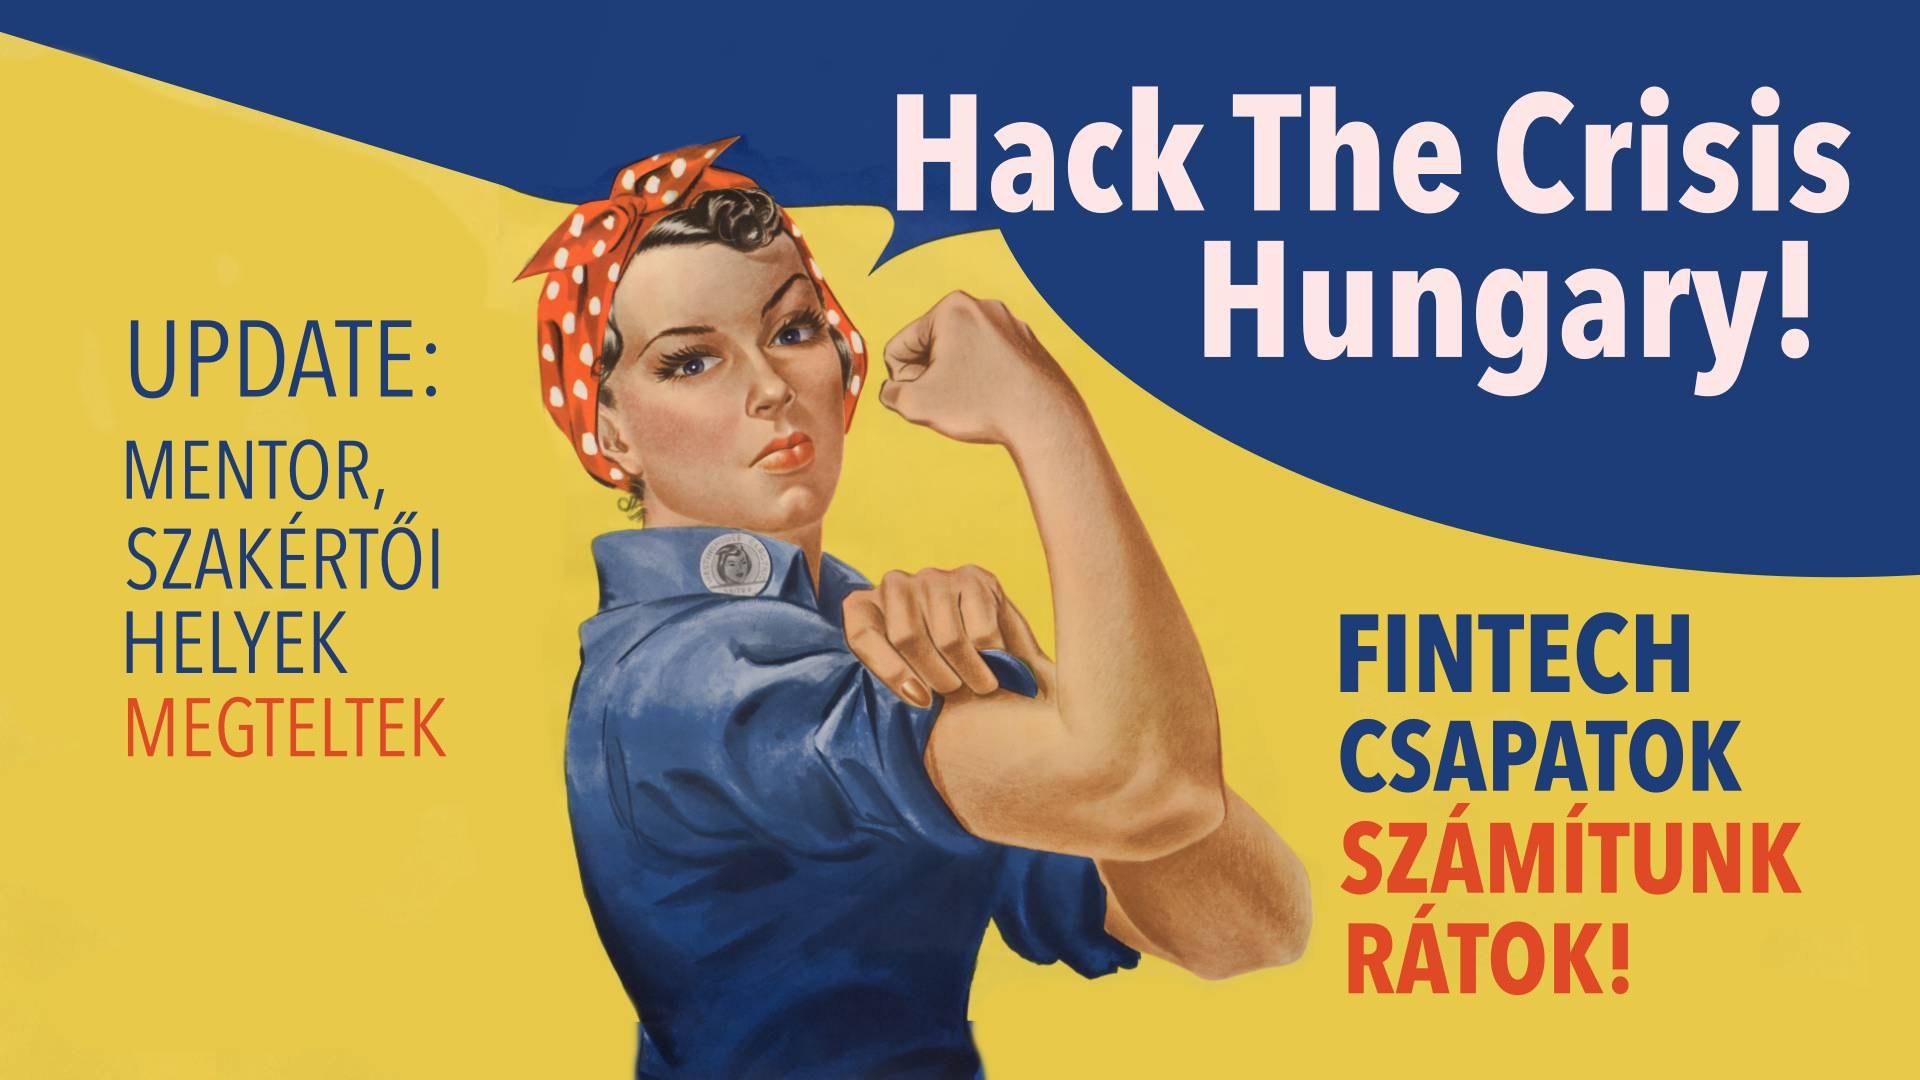 hack the crisis hungary - megtelt FINTECH CSAPATOK-2